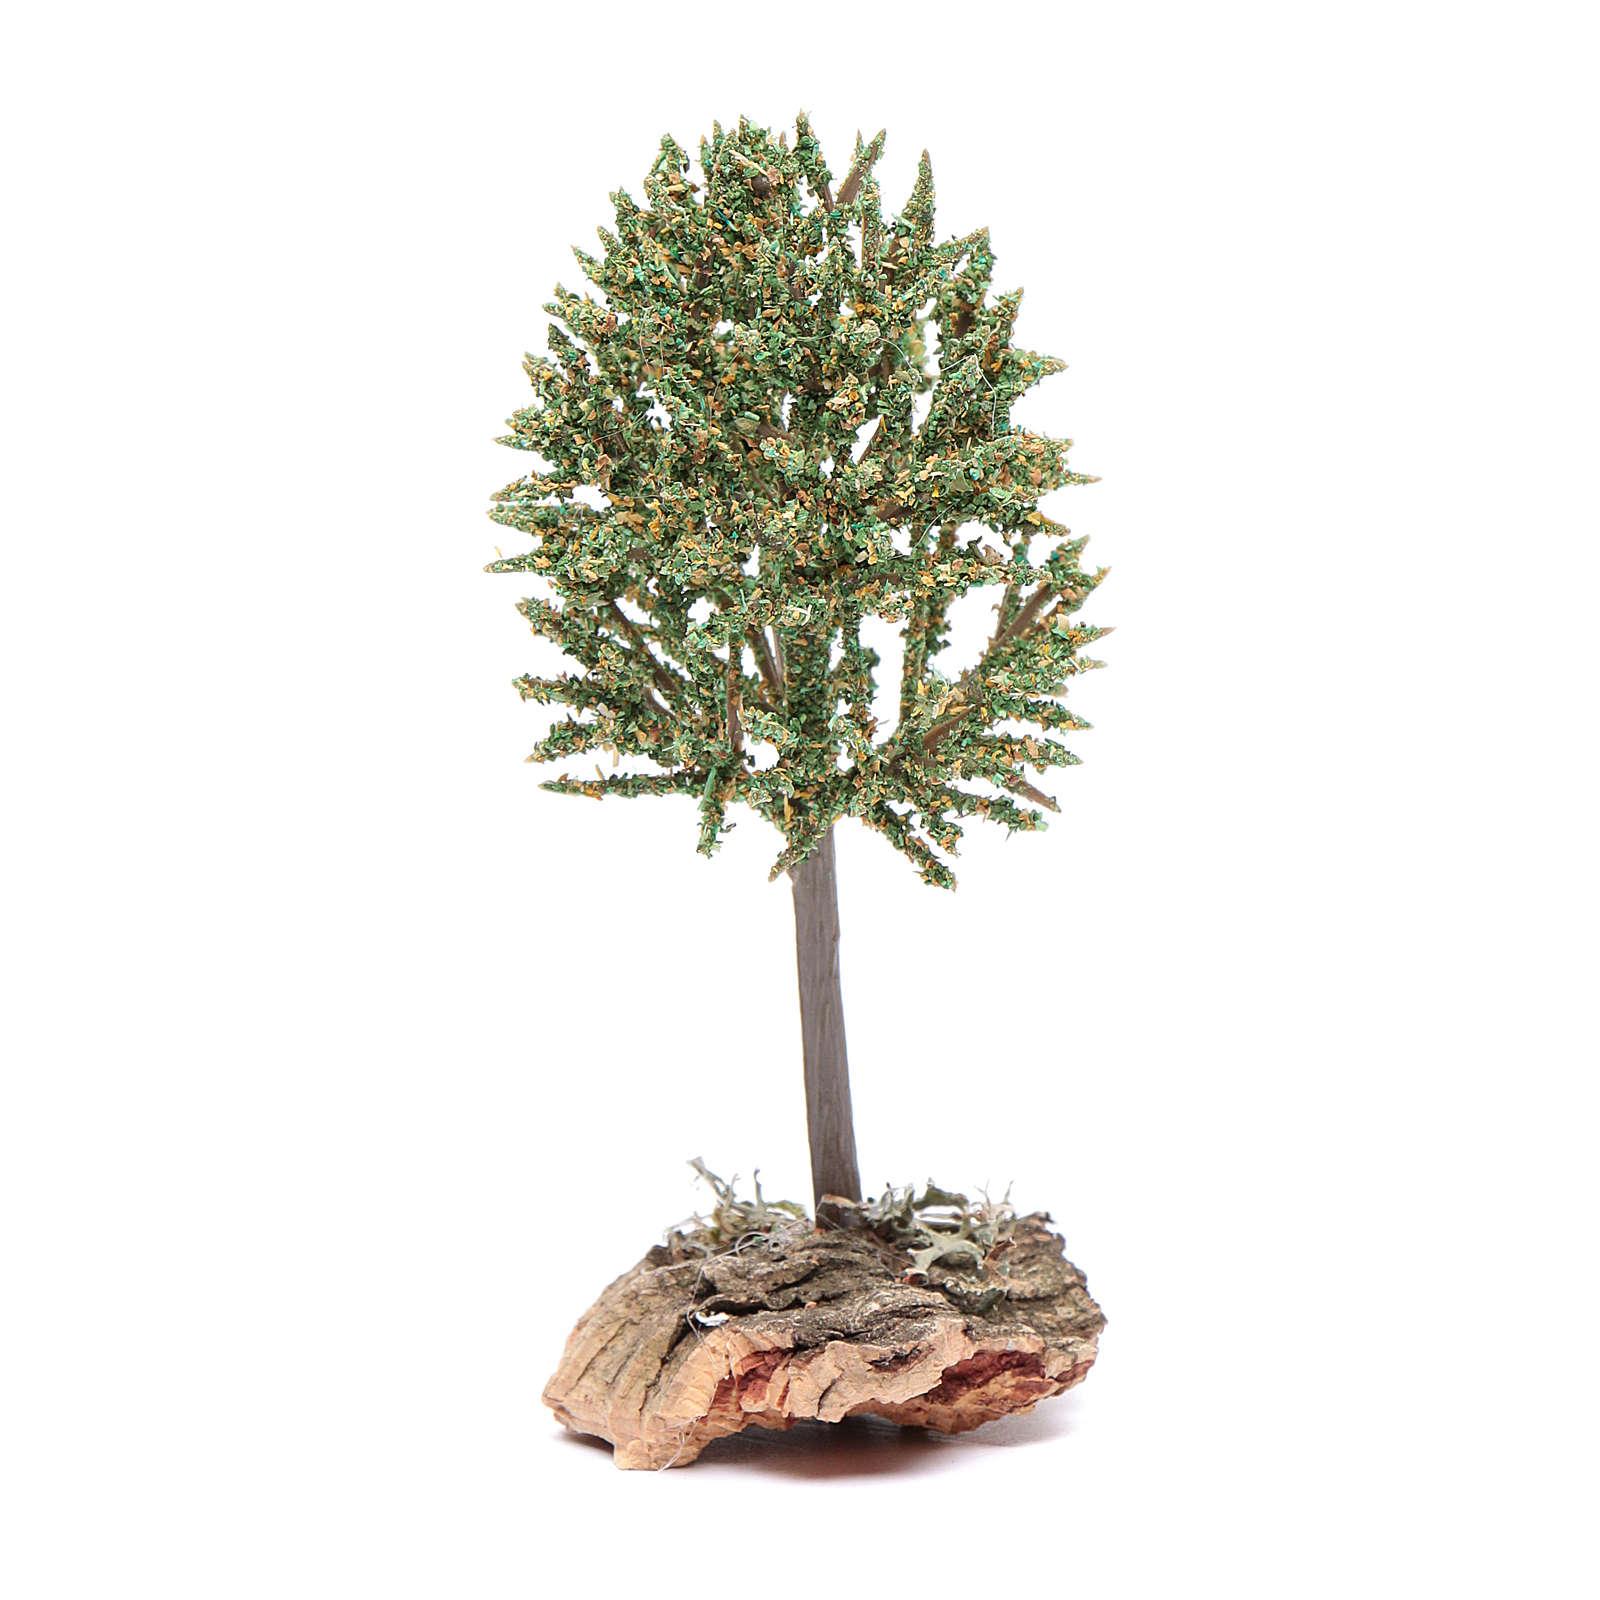 Arbolito sobre roca para belén 12 cm de altura media 4